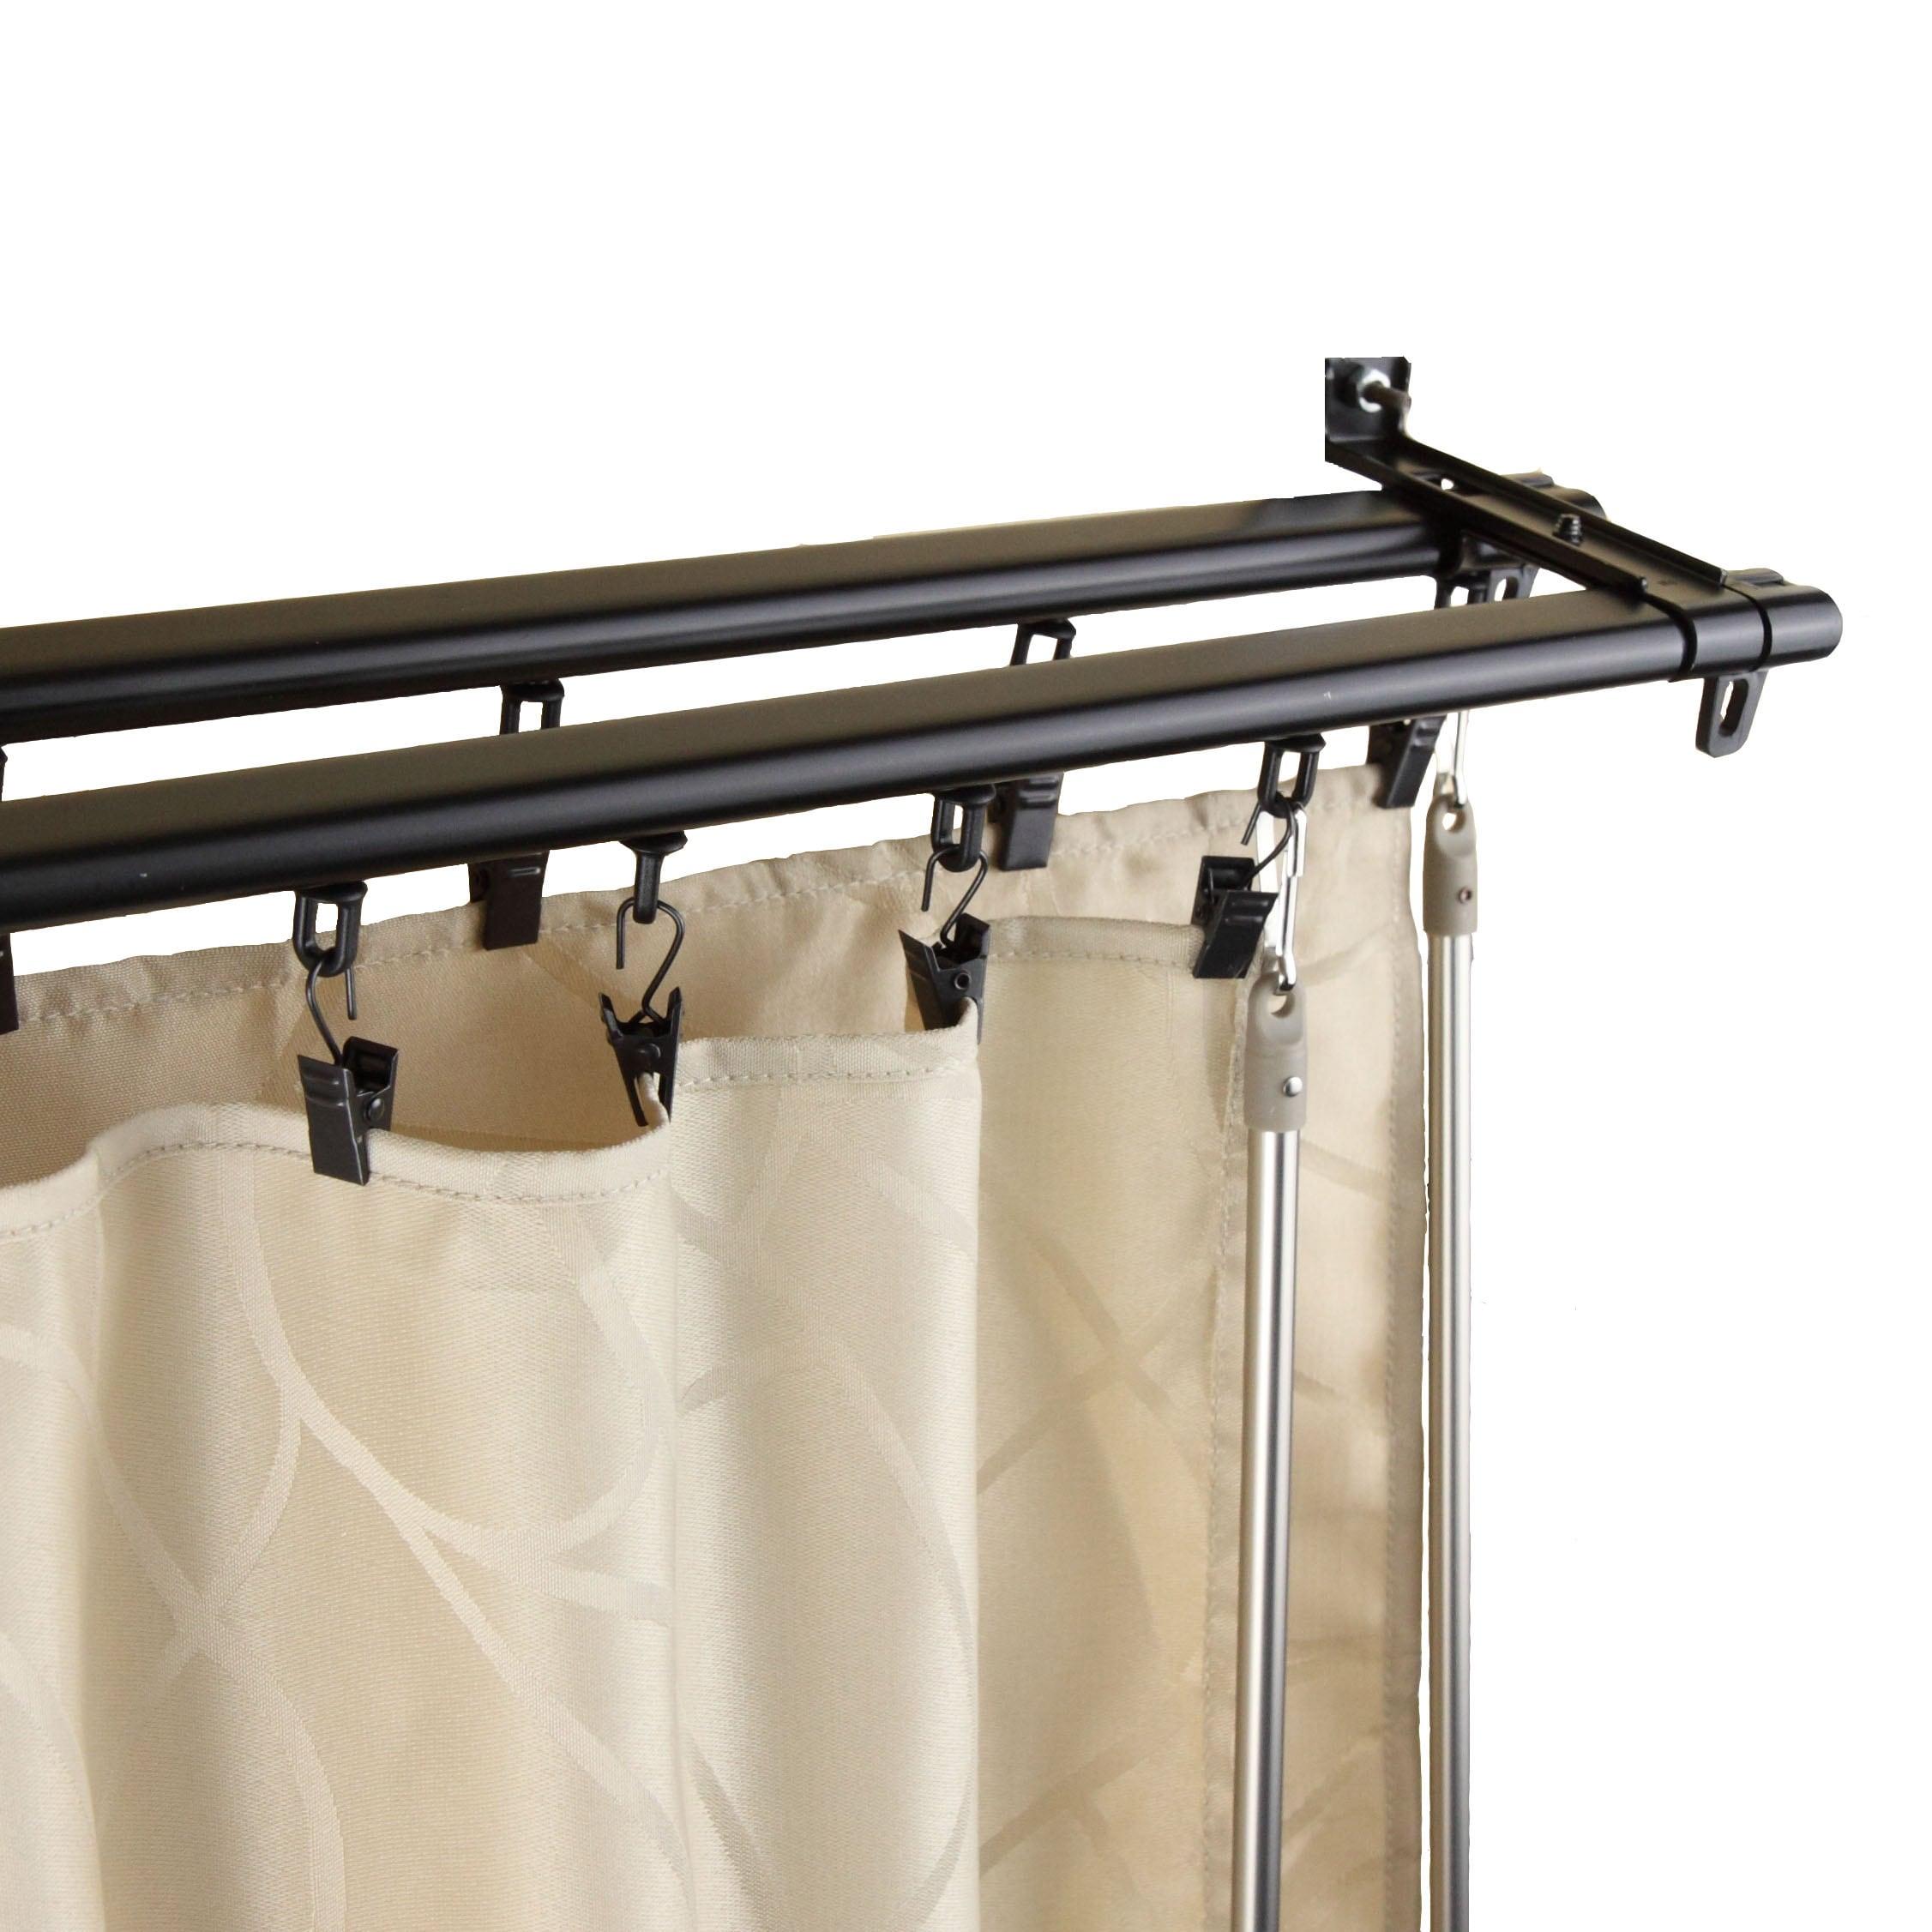 InStyleDesign Regal Black Adjustable Double Curtain Rod T...